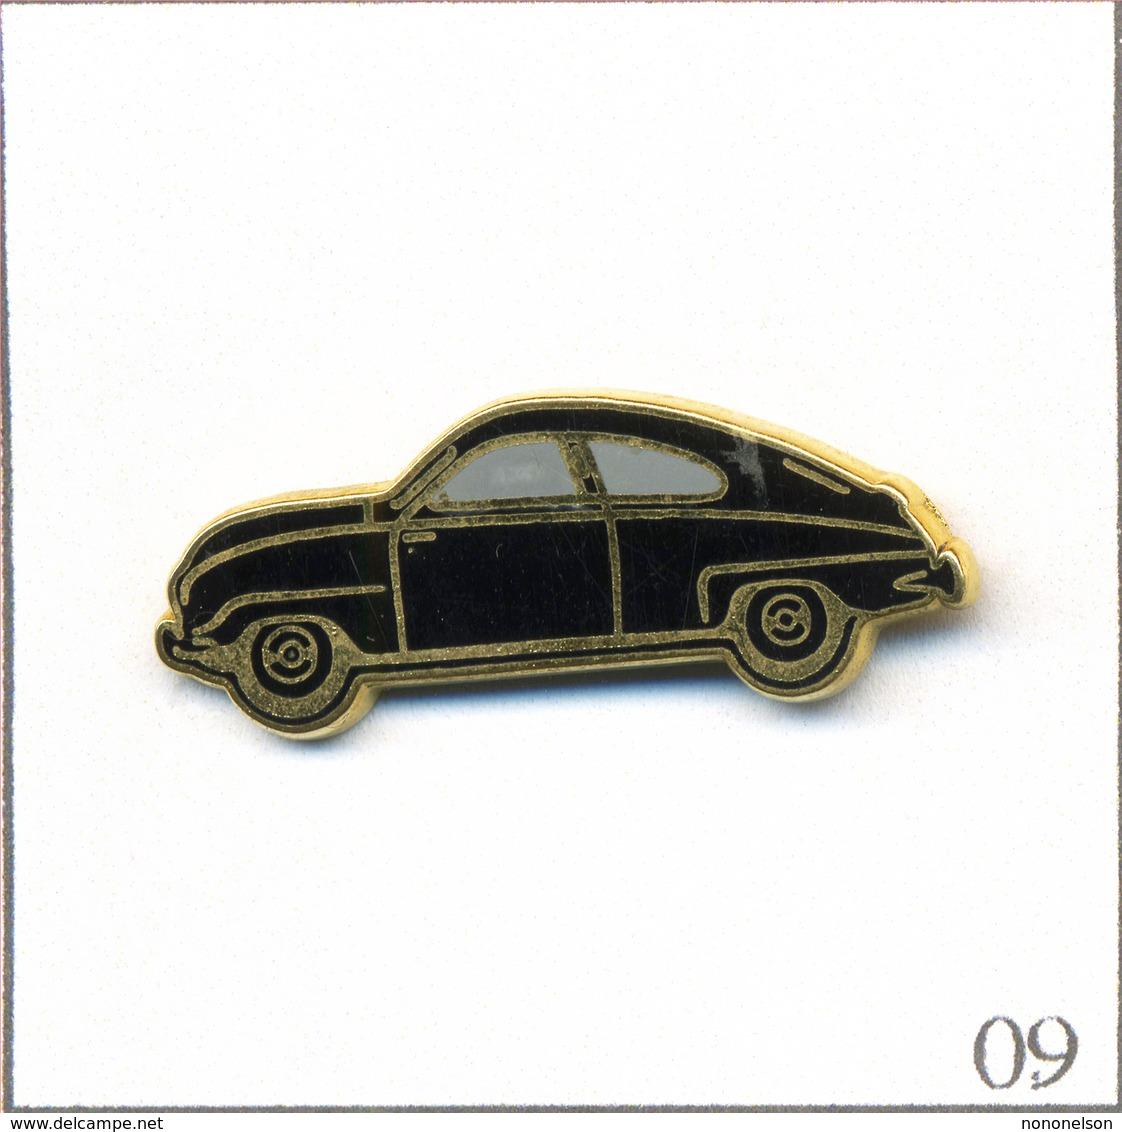 Pin's Automobile - Saab / Modèle 92 De 1949. Estampillé Made In France. Zamac. T580-09 - Pin's